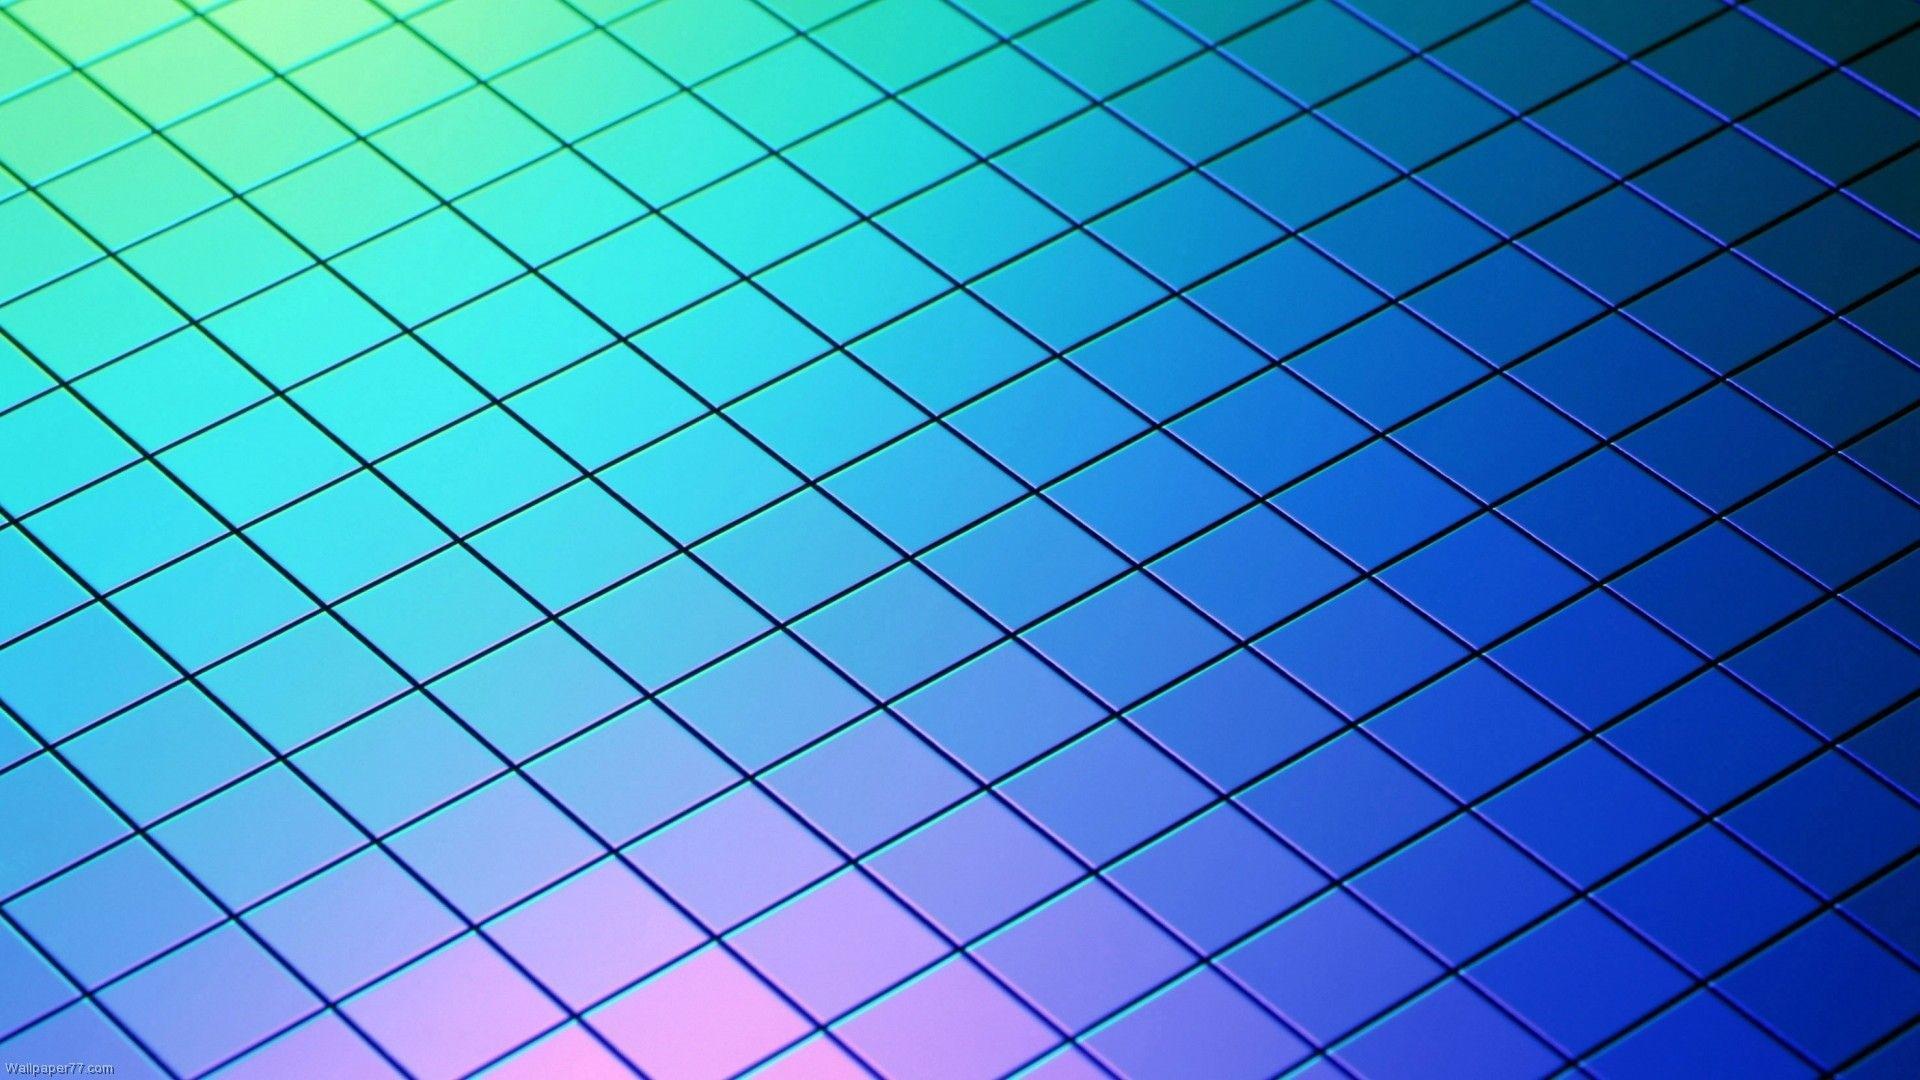 Square Desktop wallpaper